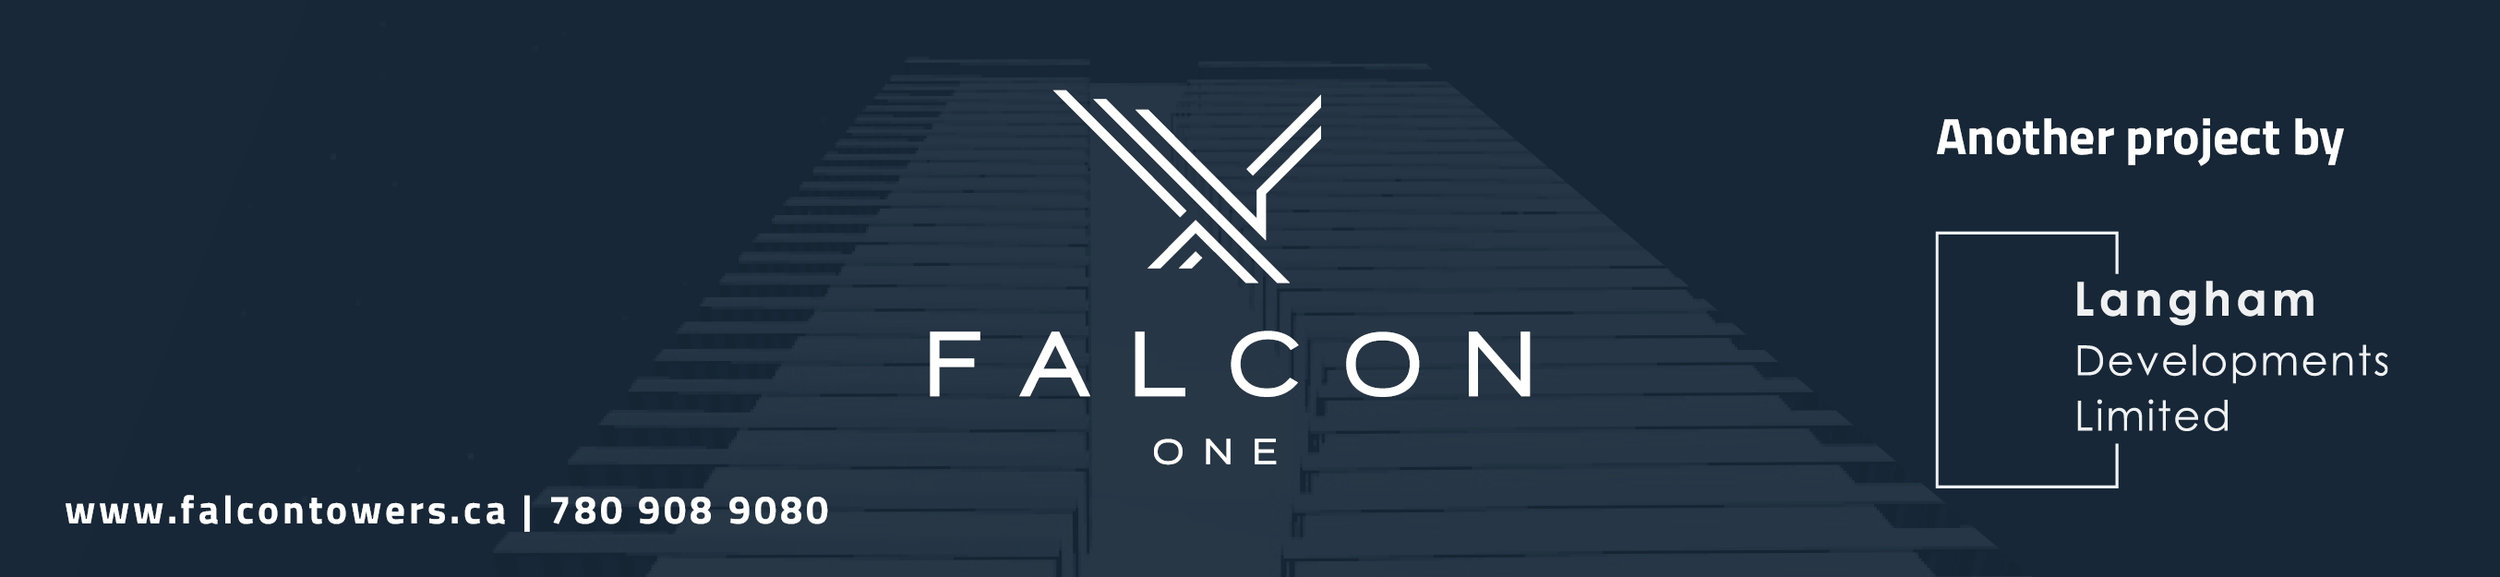 FalconOne Email Header.jpg